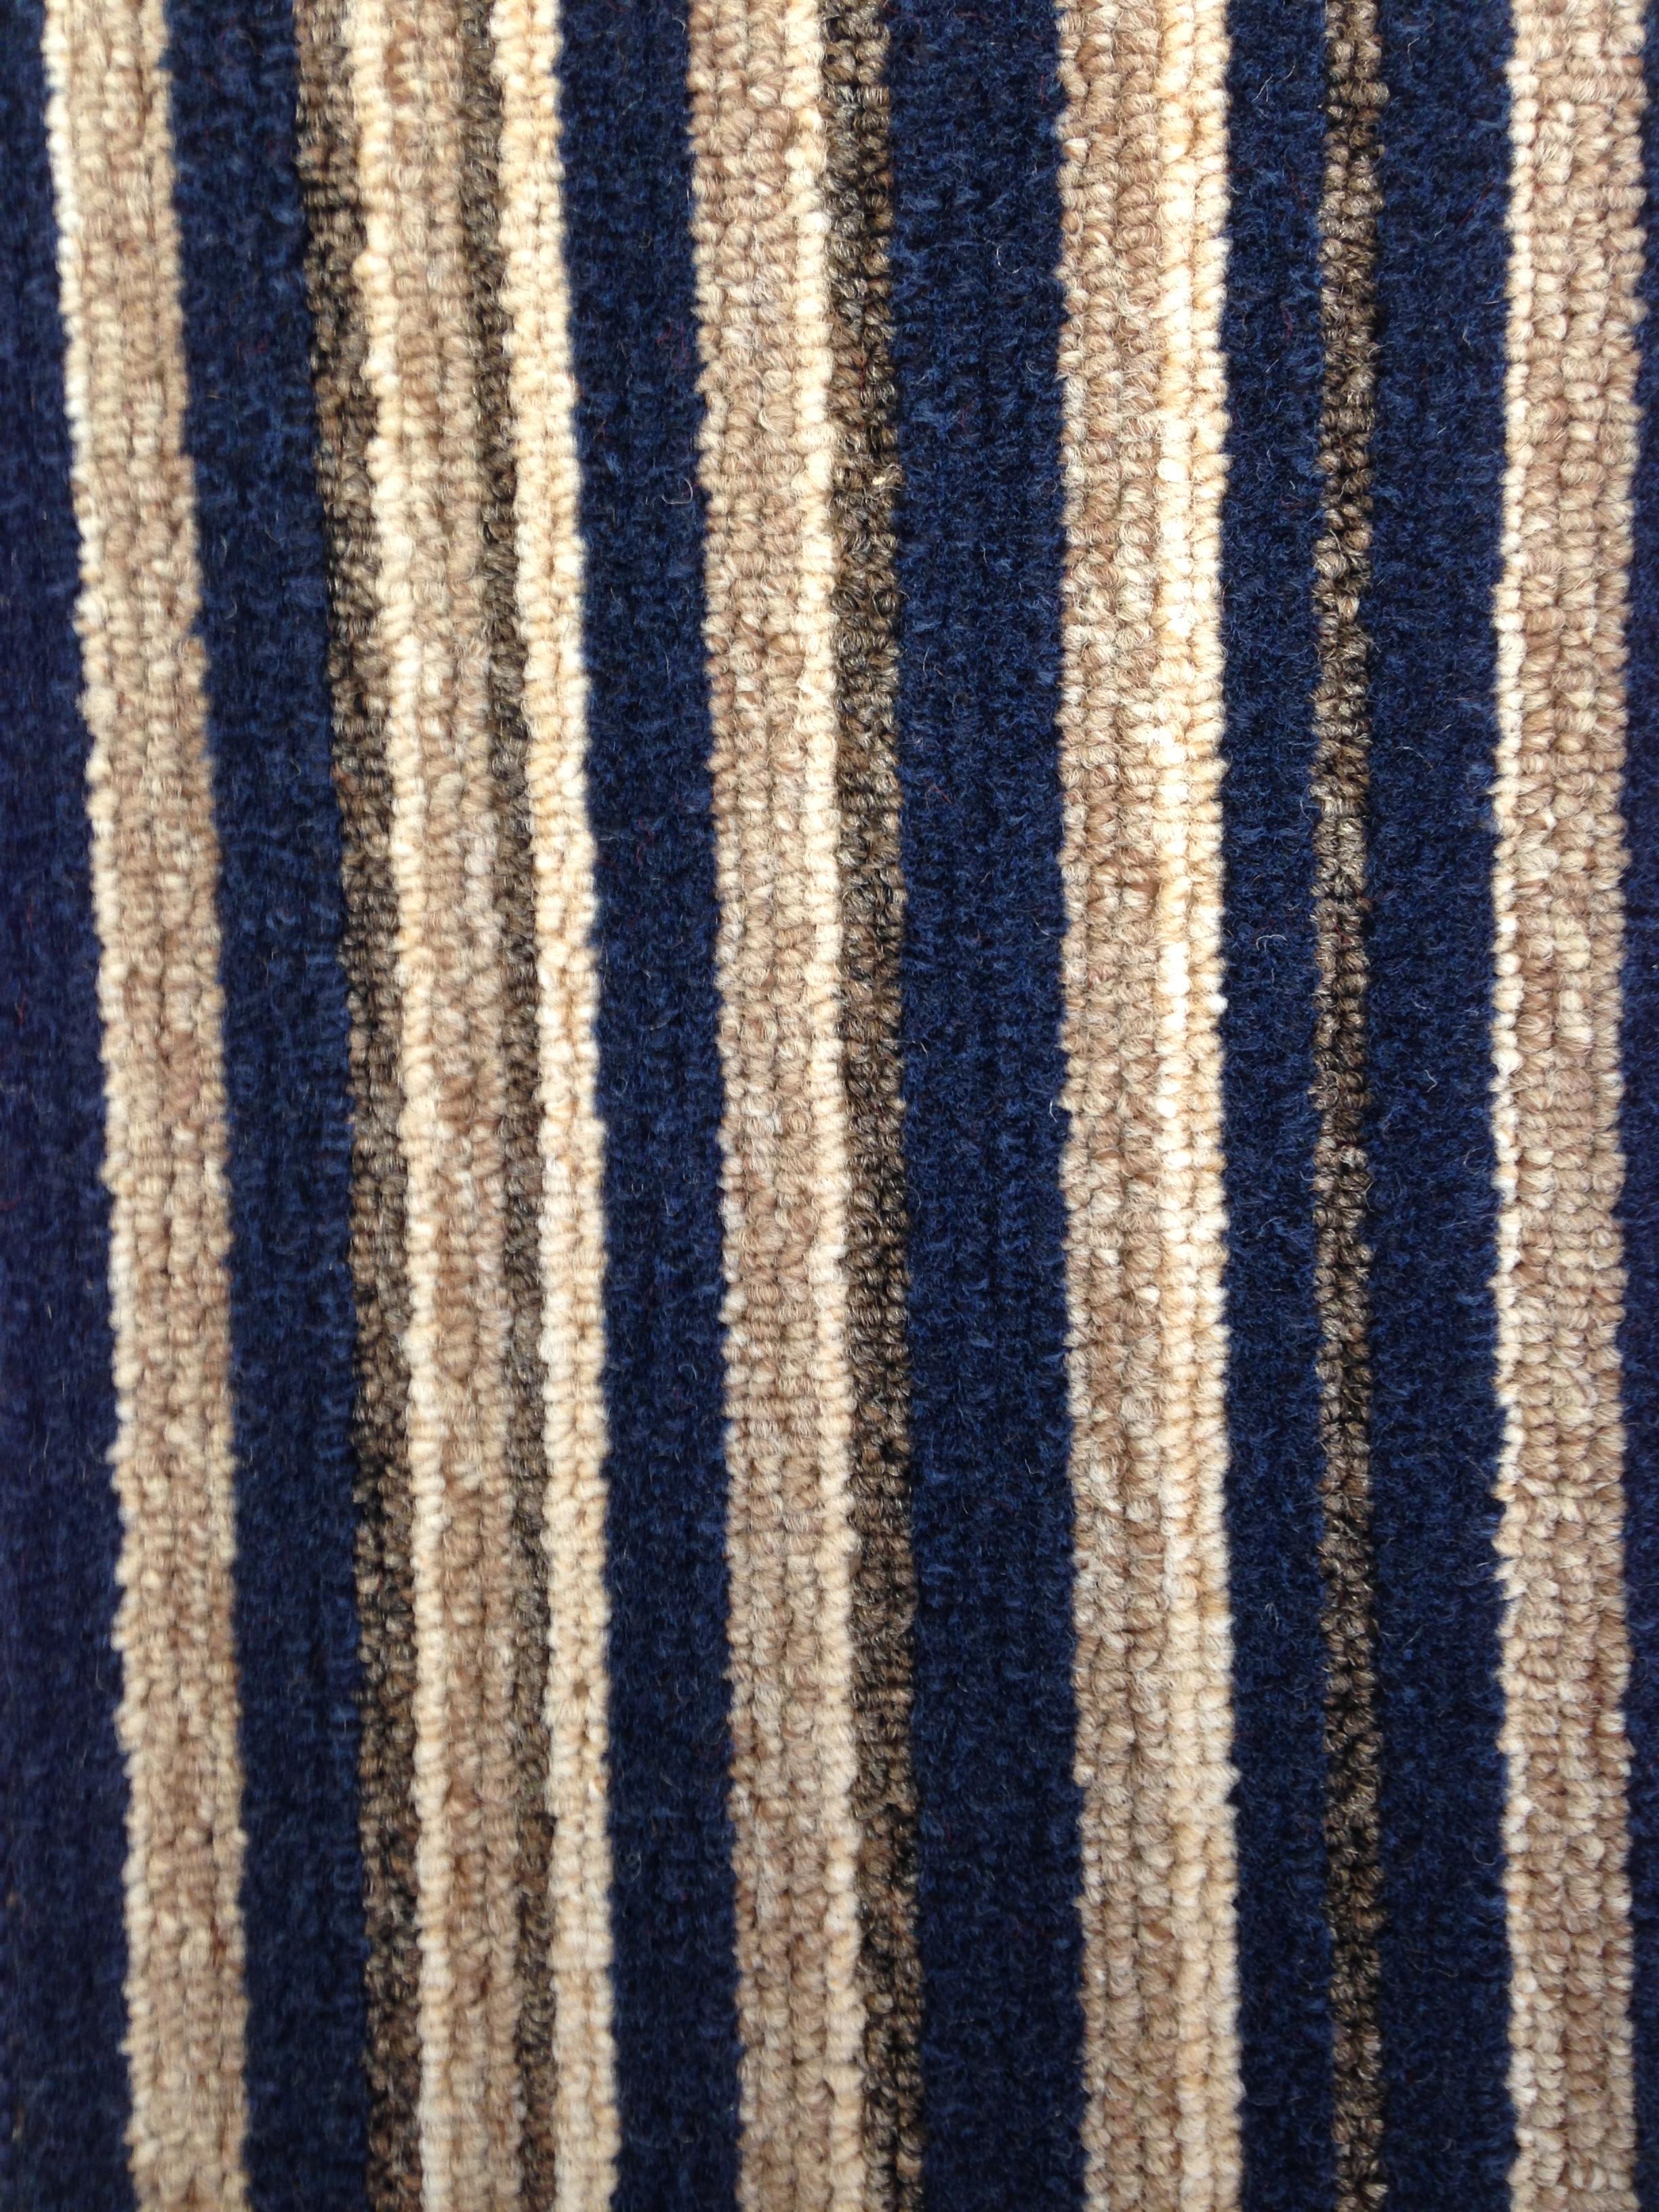 A Dozen Stripes - Waterside 380